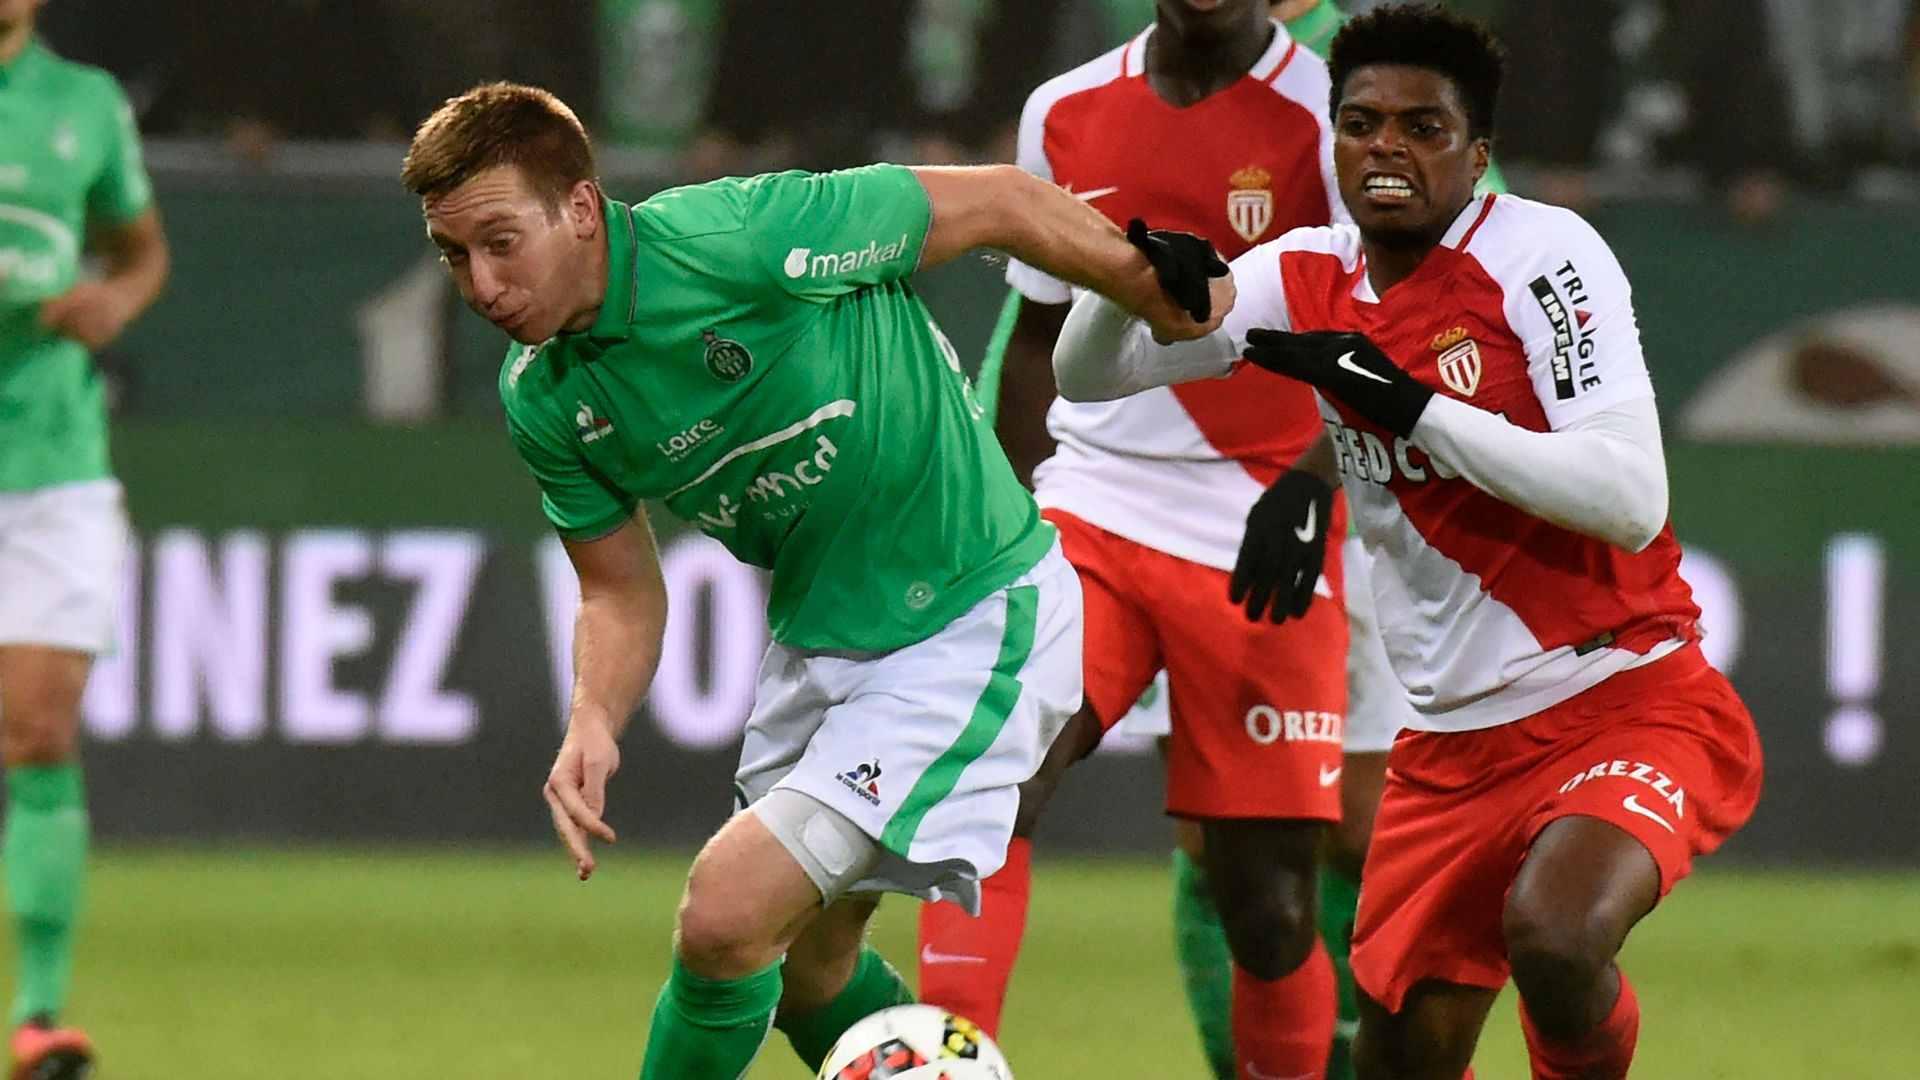 Saint Etienne vs Monaco: Prediction, Lineups, Team News, Betting Tips & Match Previews